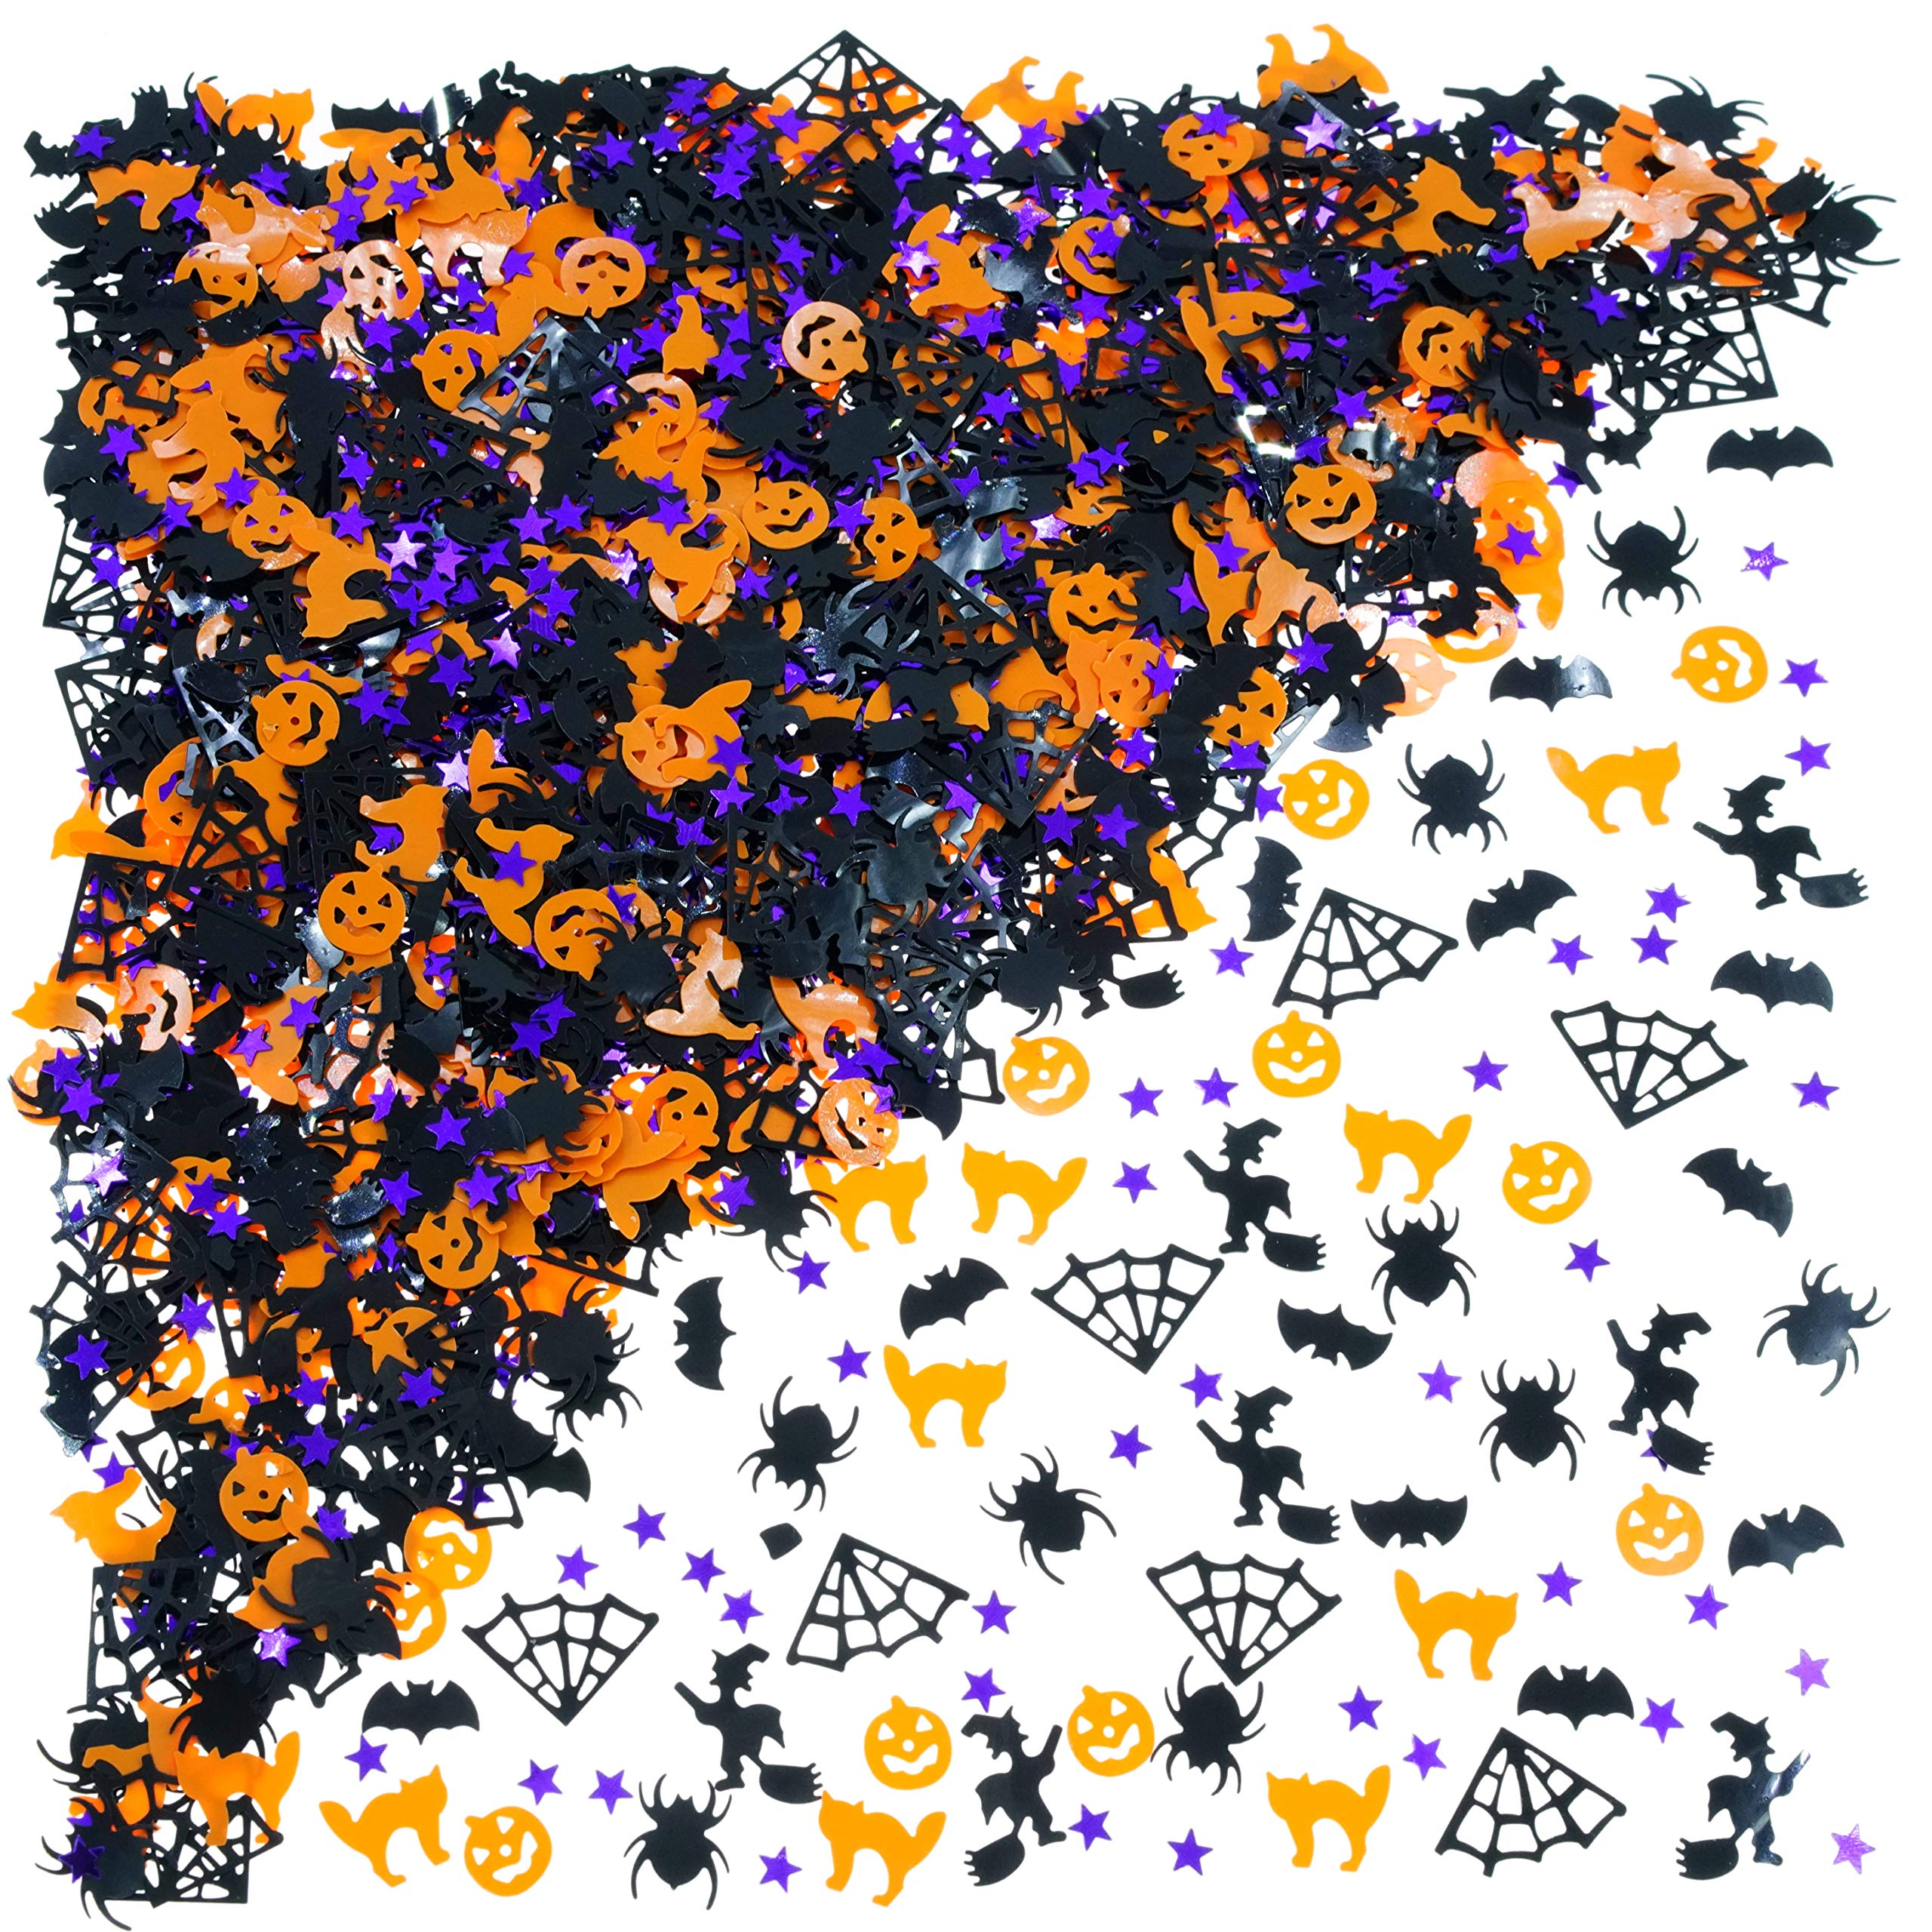 15g Halloween Confetti Pumpkin Spider Witch Bats Confetti Sprinkle Table DecHF